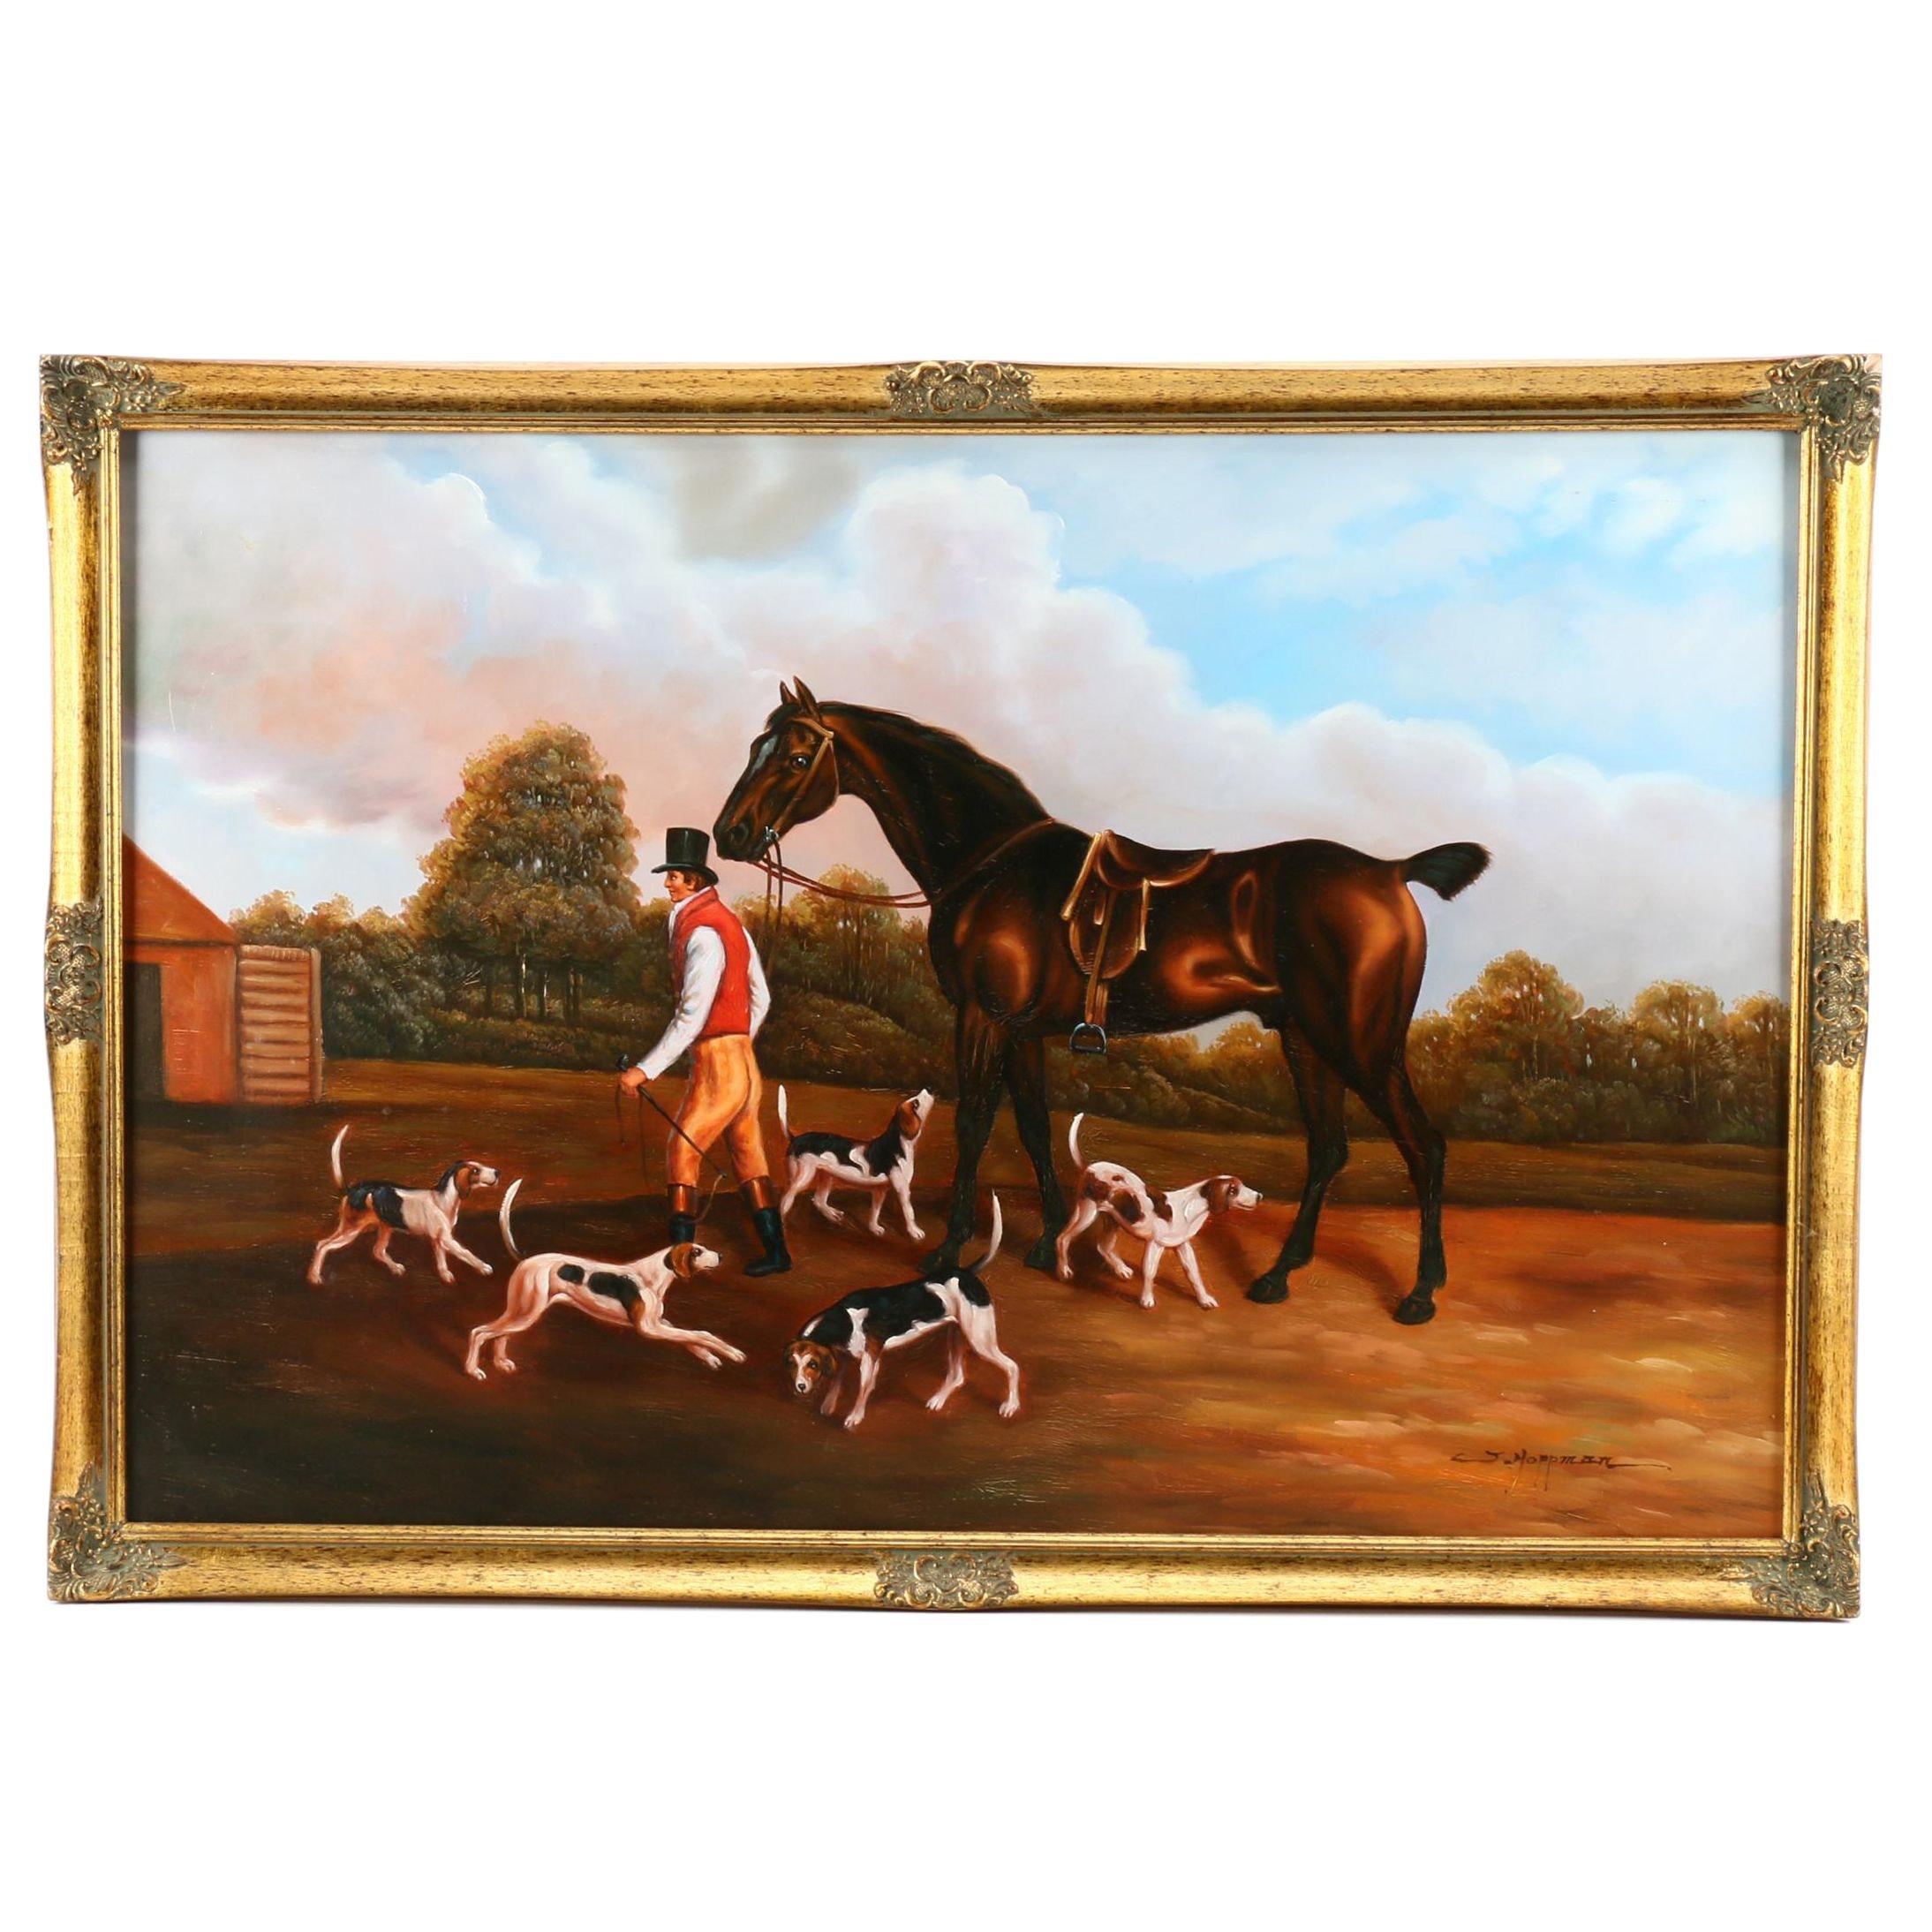 J. Hoppman Contemporary Hunting Genre Oil Painting